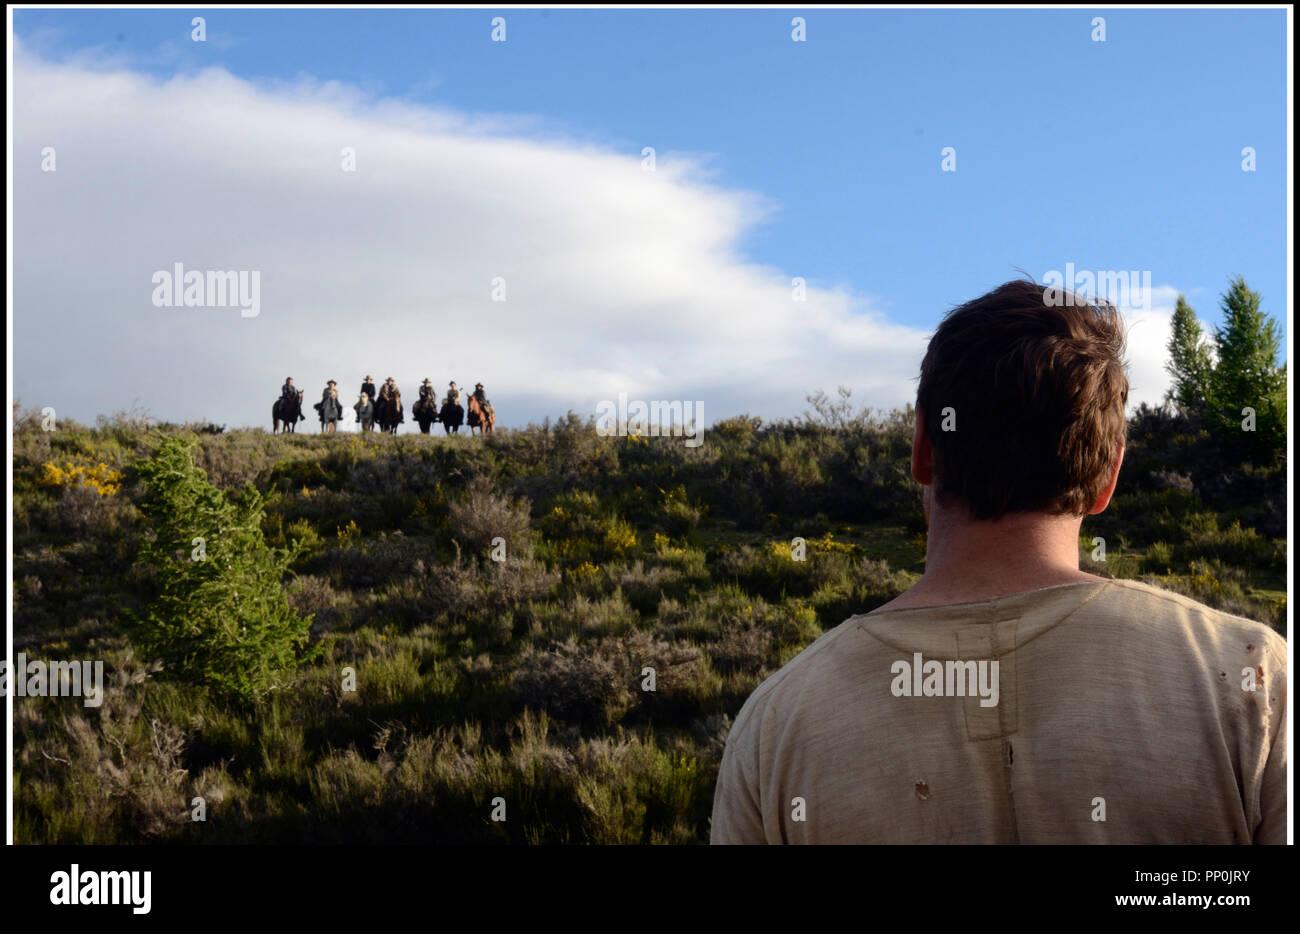 Prod DB © See-Saw Films - DMC Film - Film4 - New Zealand Film